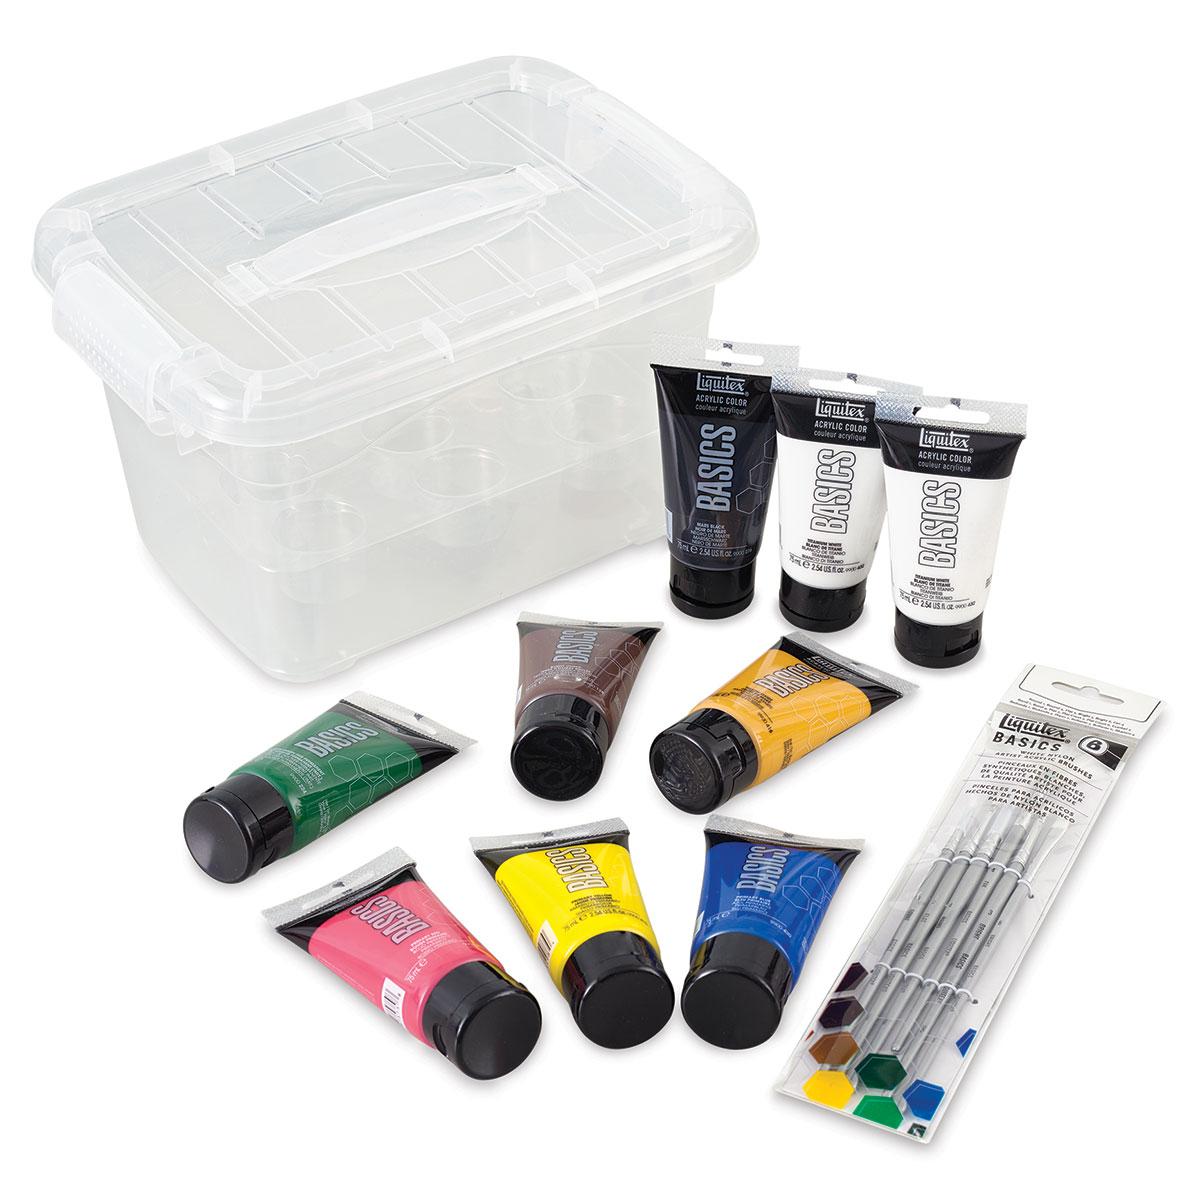 LIQUITEX basic starter set